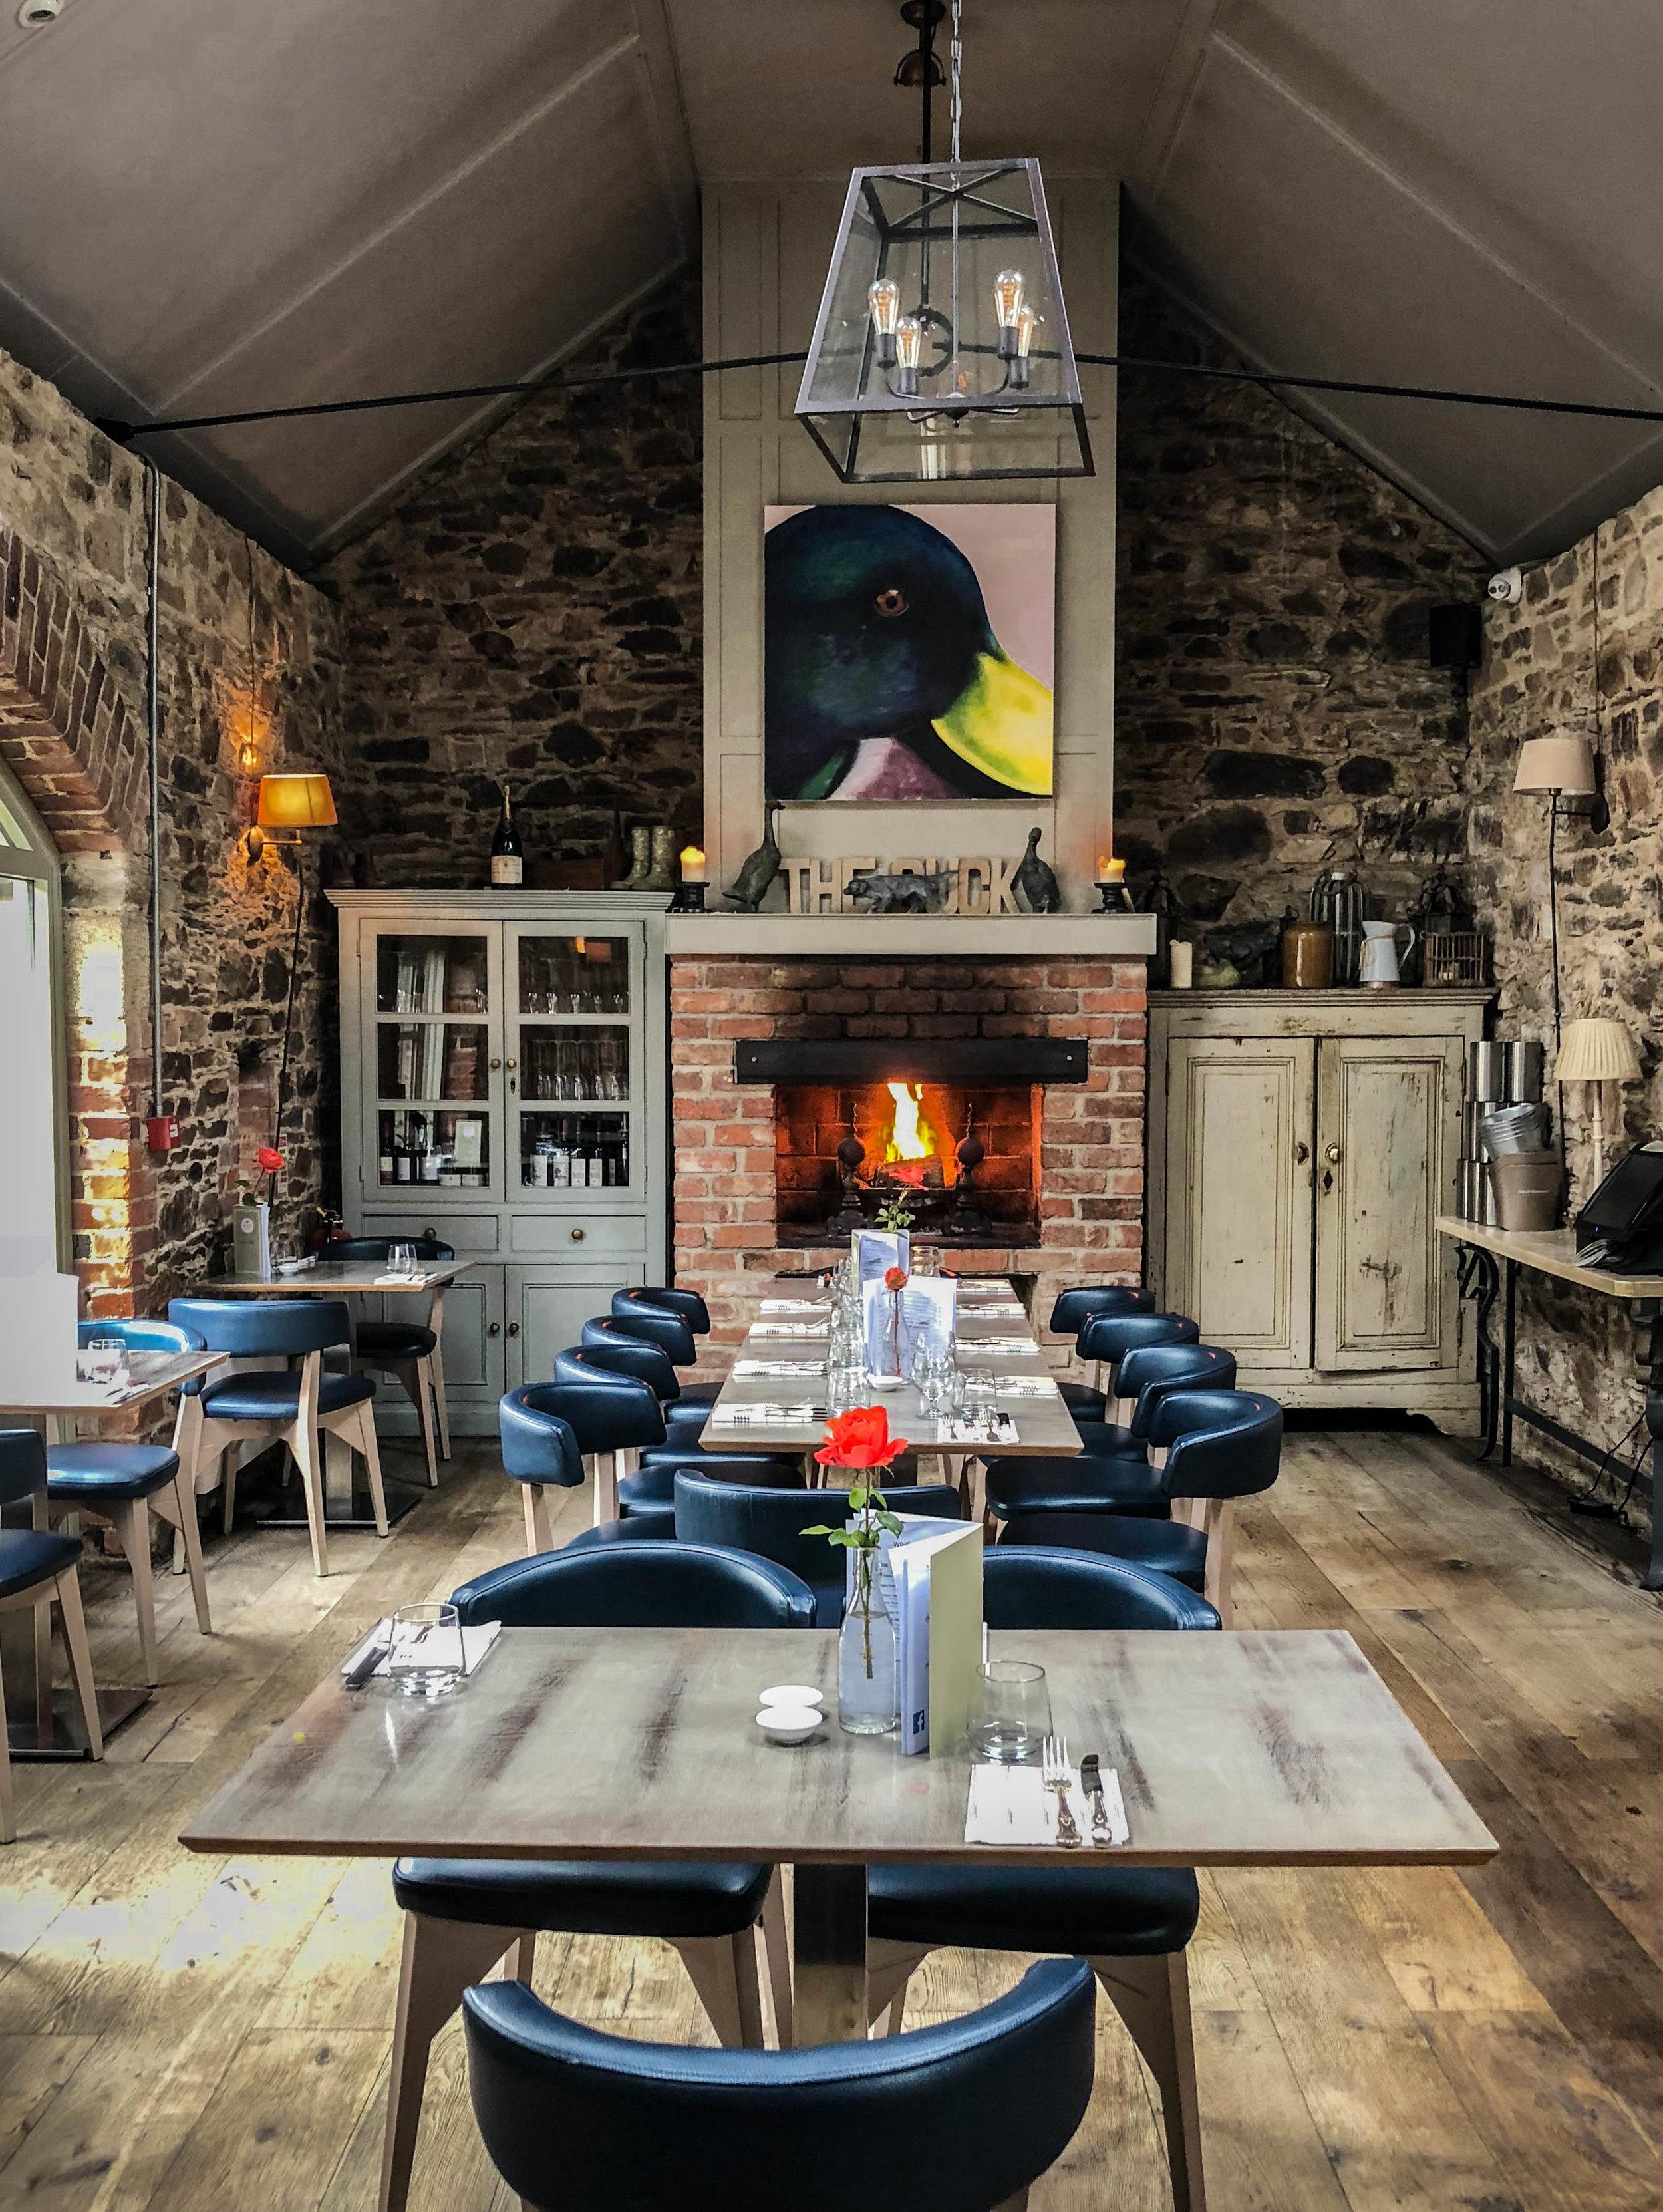 The_Duck_Terrace_Restaurant_Weston_Table.jpg